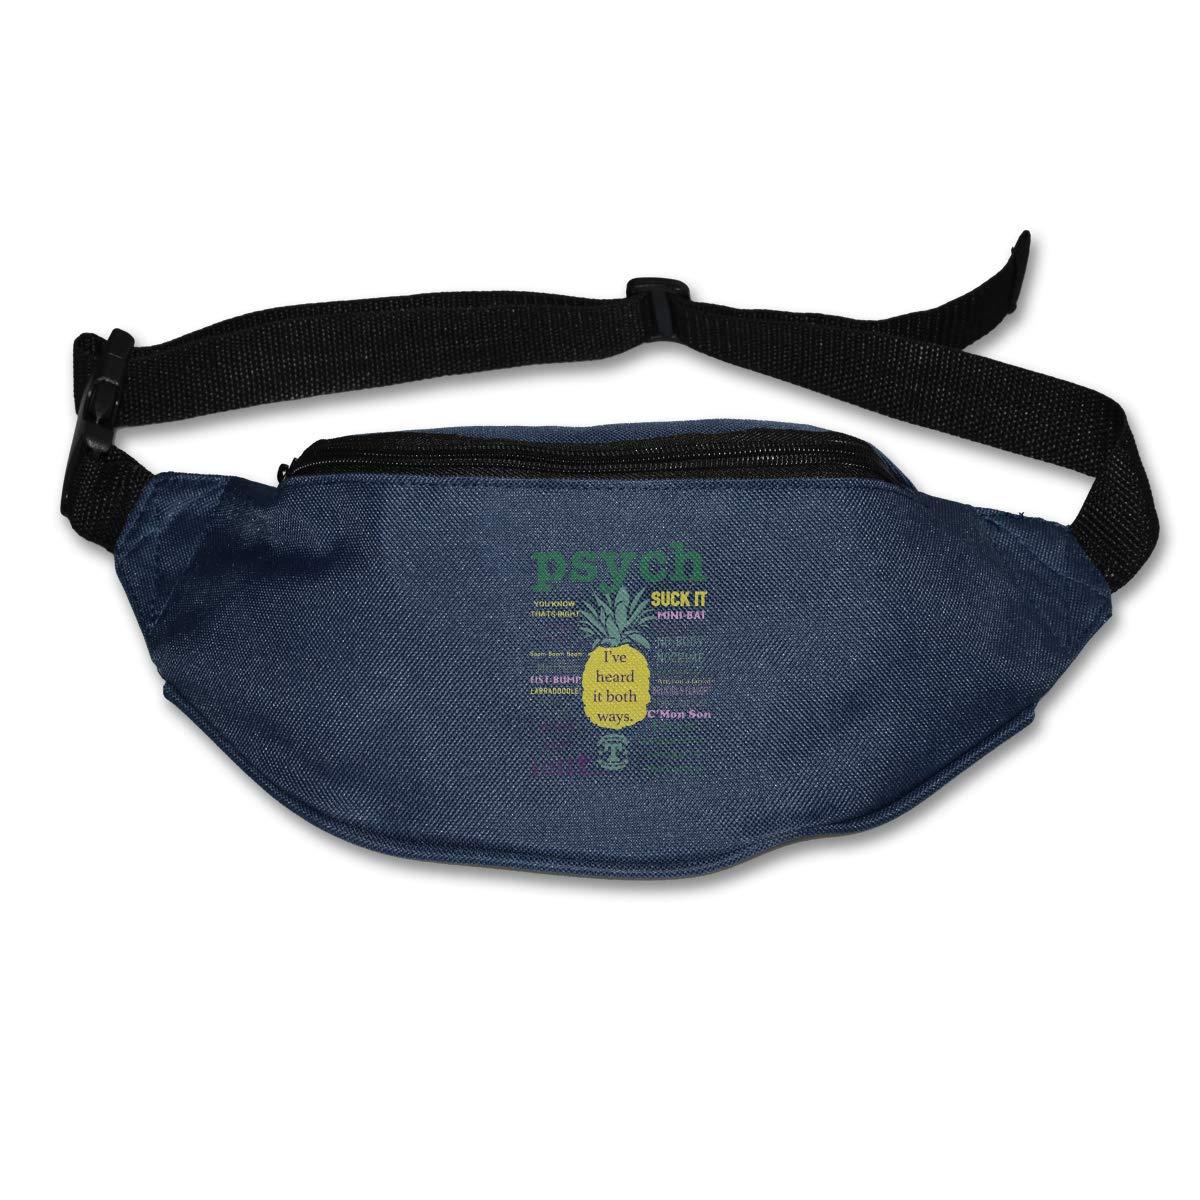 Psych Suck It Pineapple Delicious Sunny Pack Waist Bag Travel Pocket Sling Chest Shoulder Bag Phone Holder Running Belt With Separate Pockets